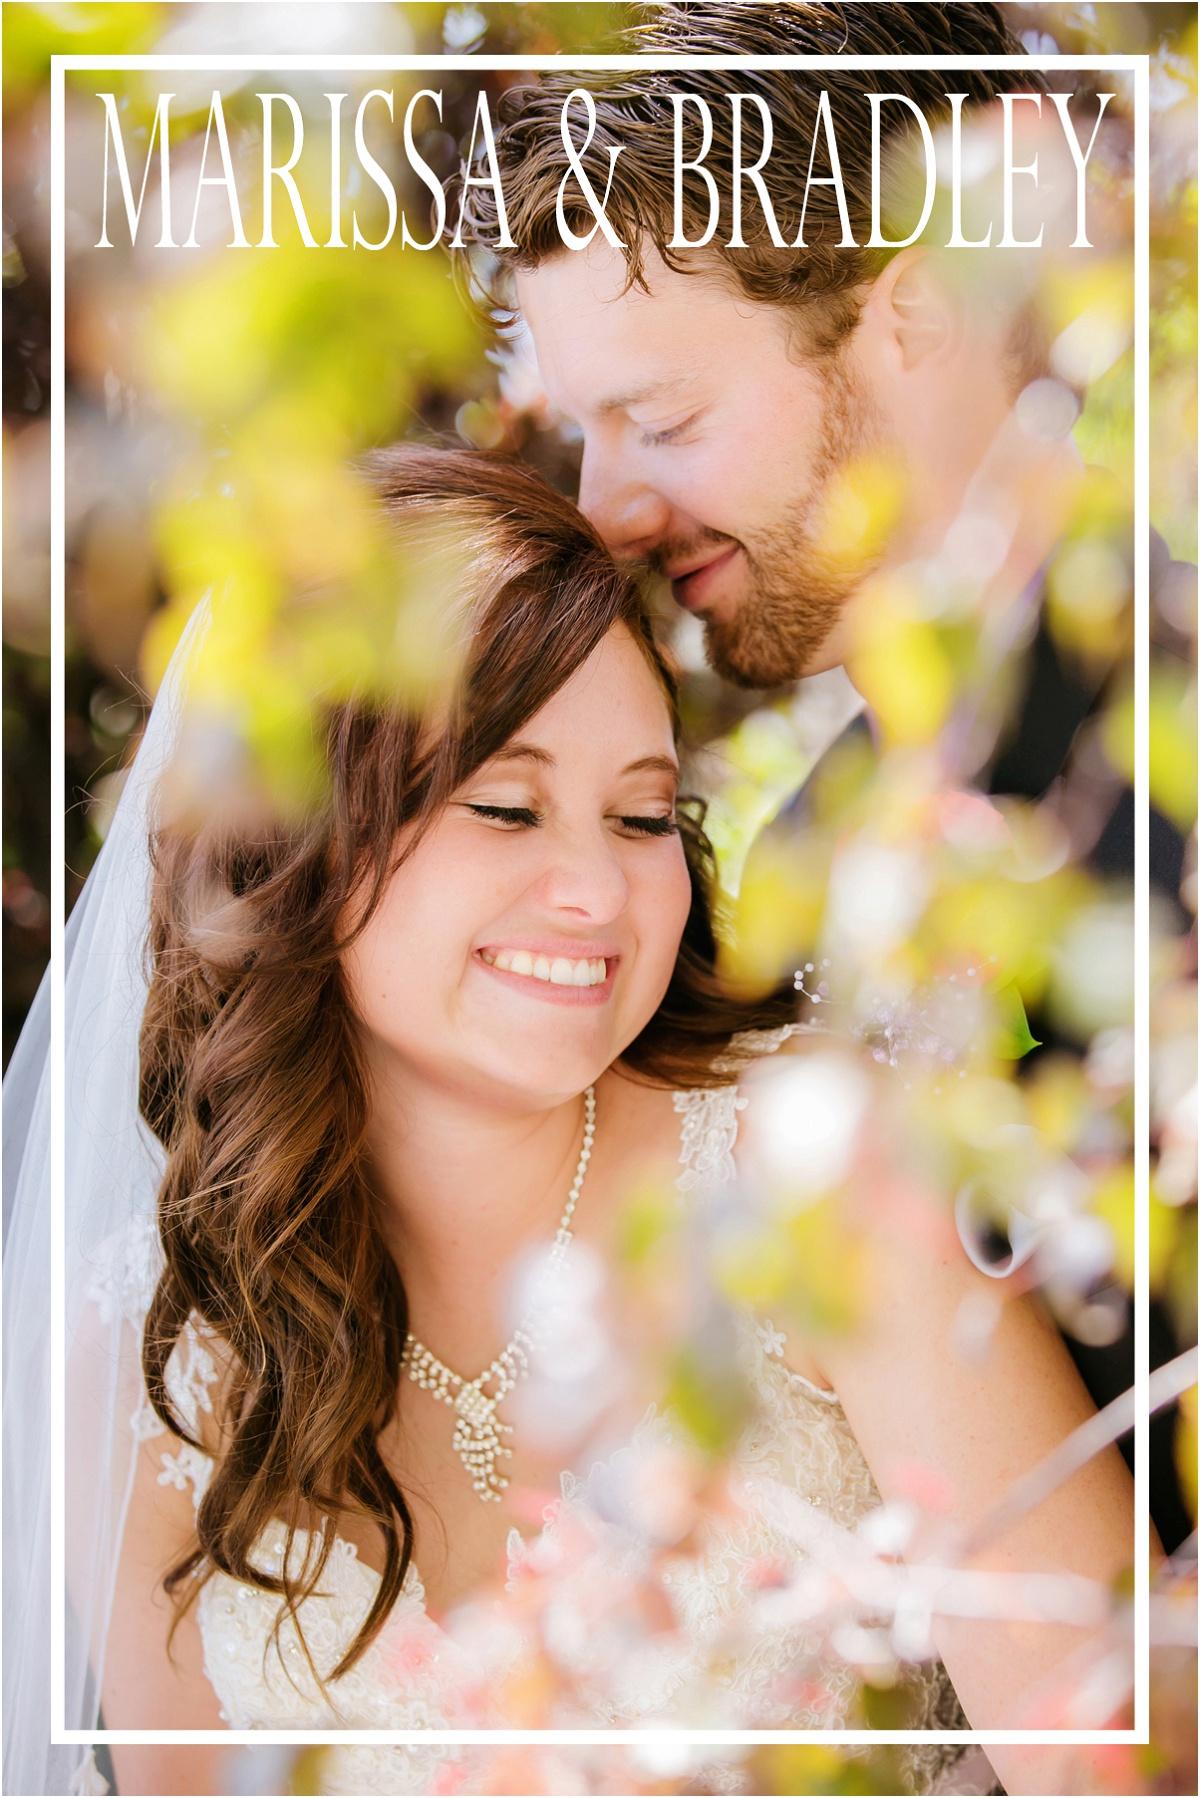 Terra Cooper Photography Weddings Brides 2015_5396.jpg